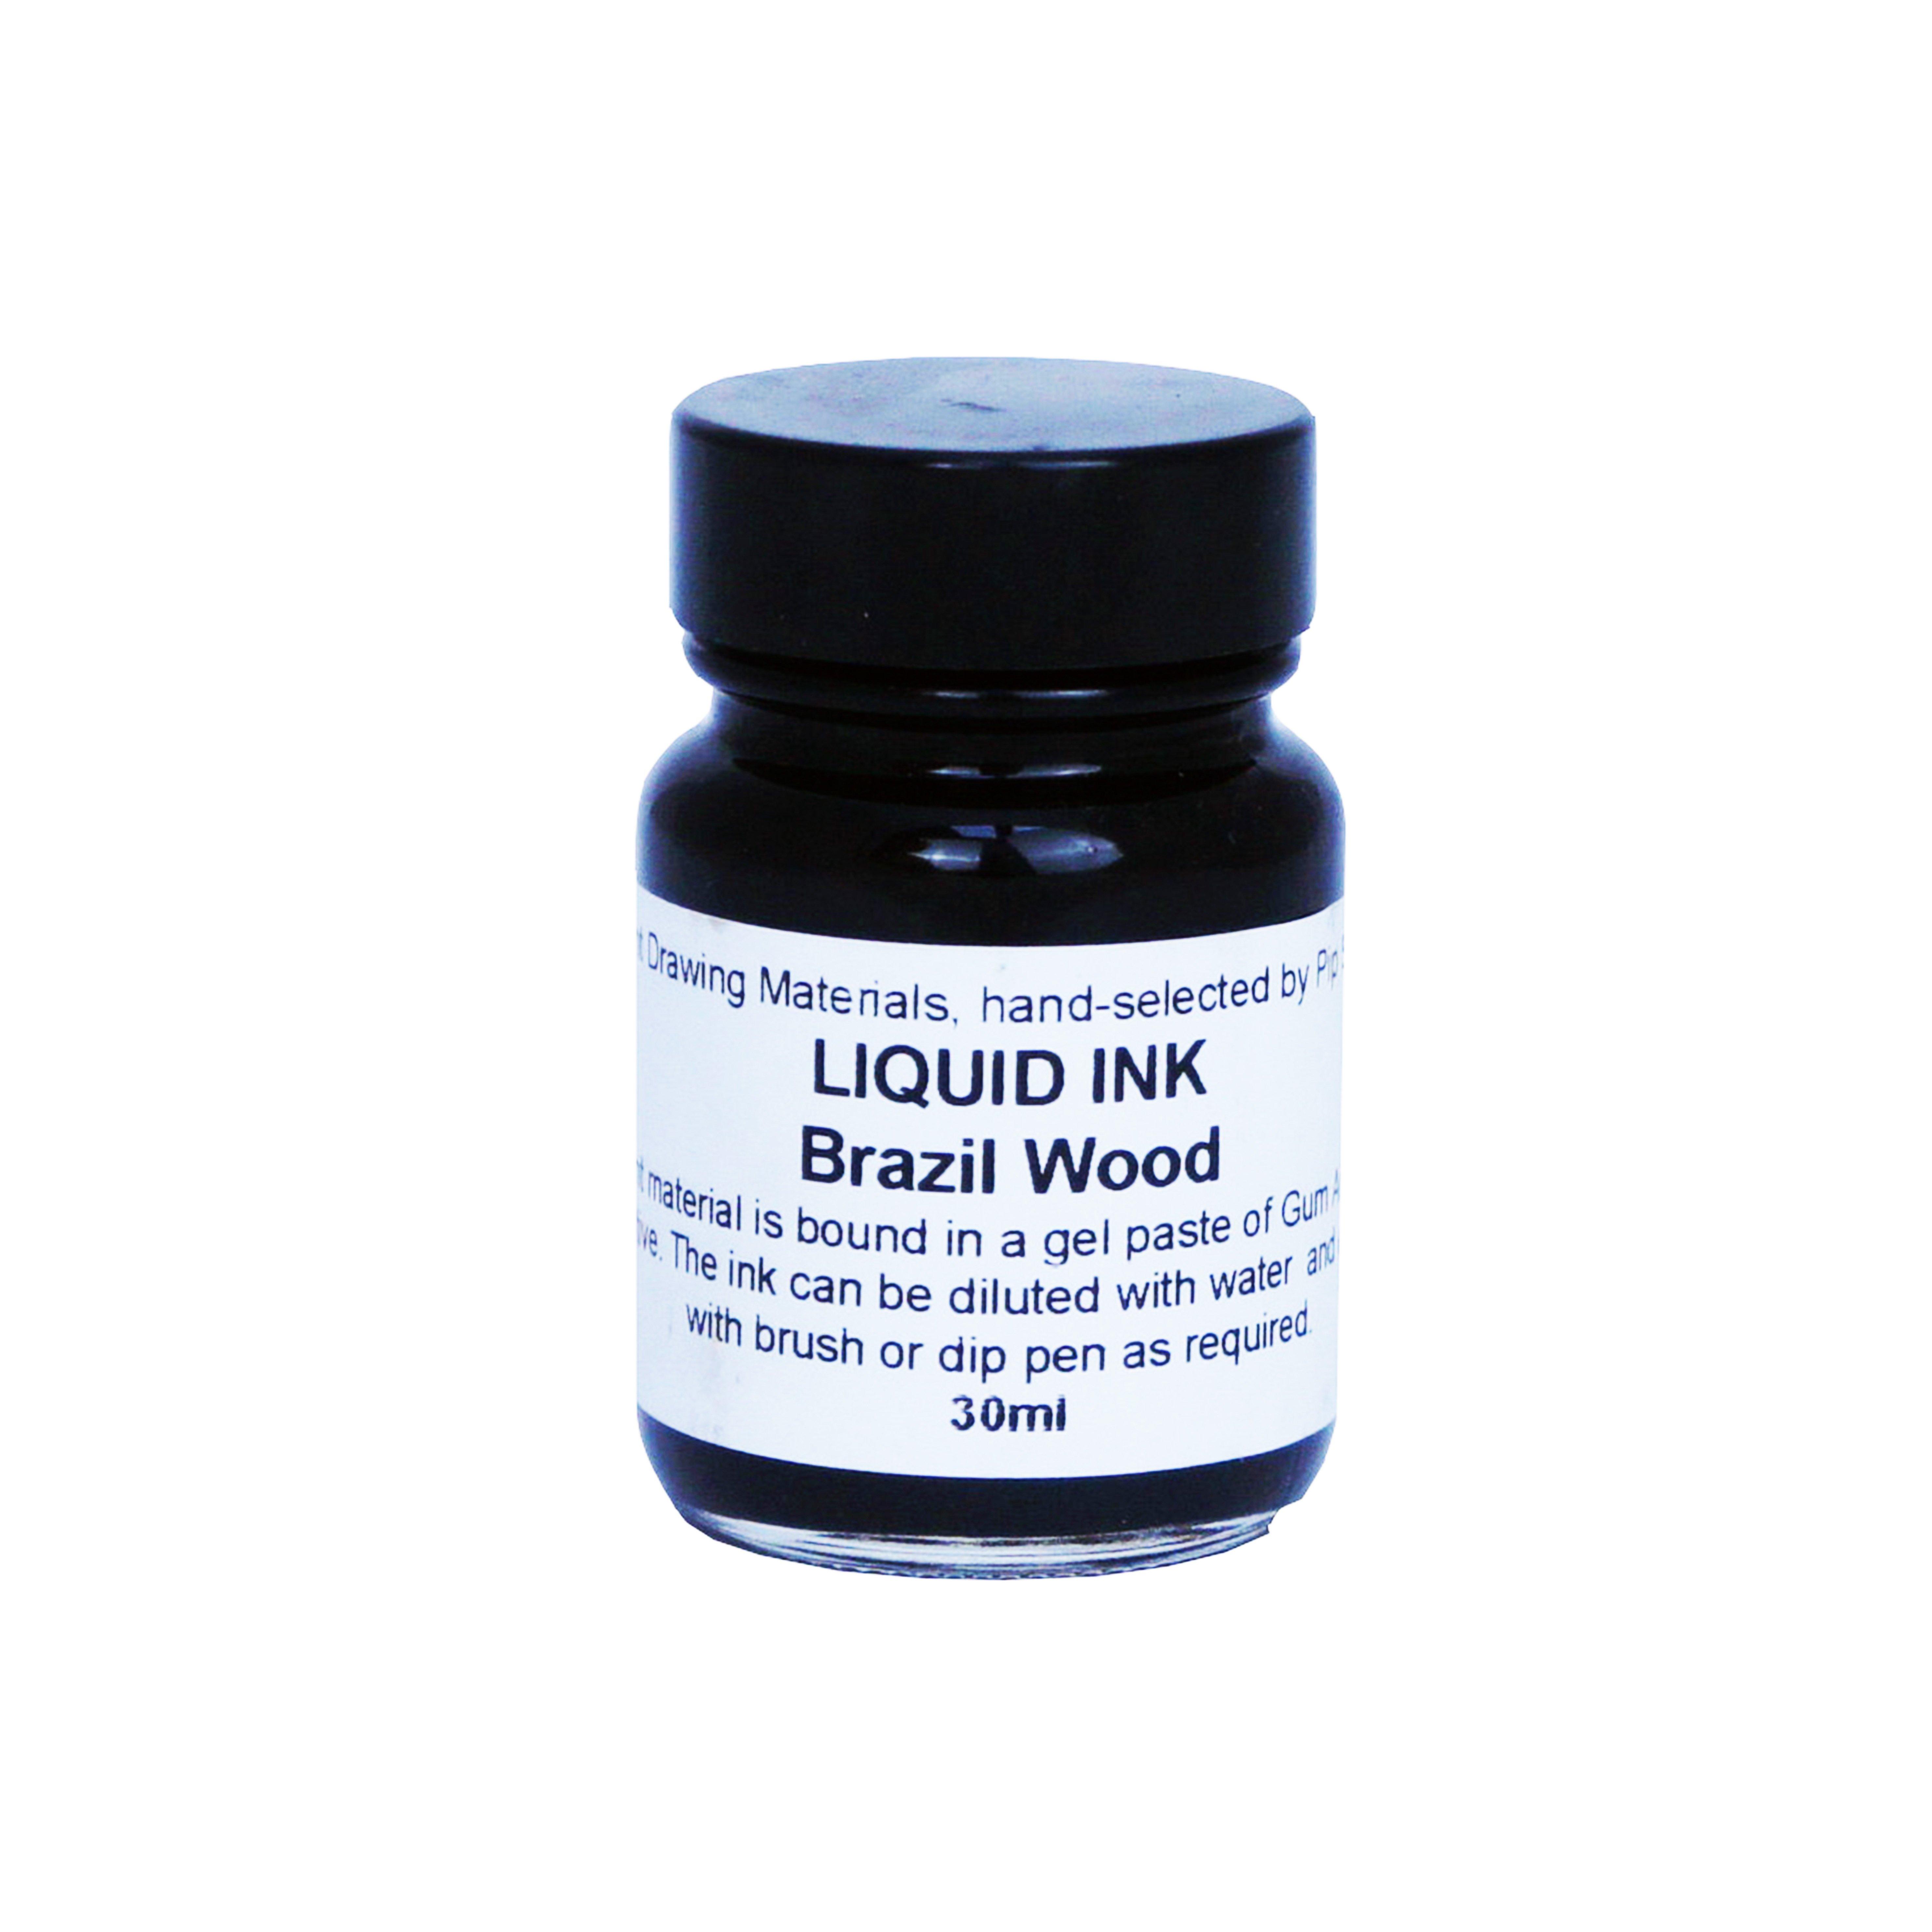 Brazil Wood Ink 30ml London Art Shop Buy Art Supplies